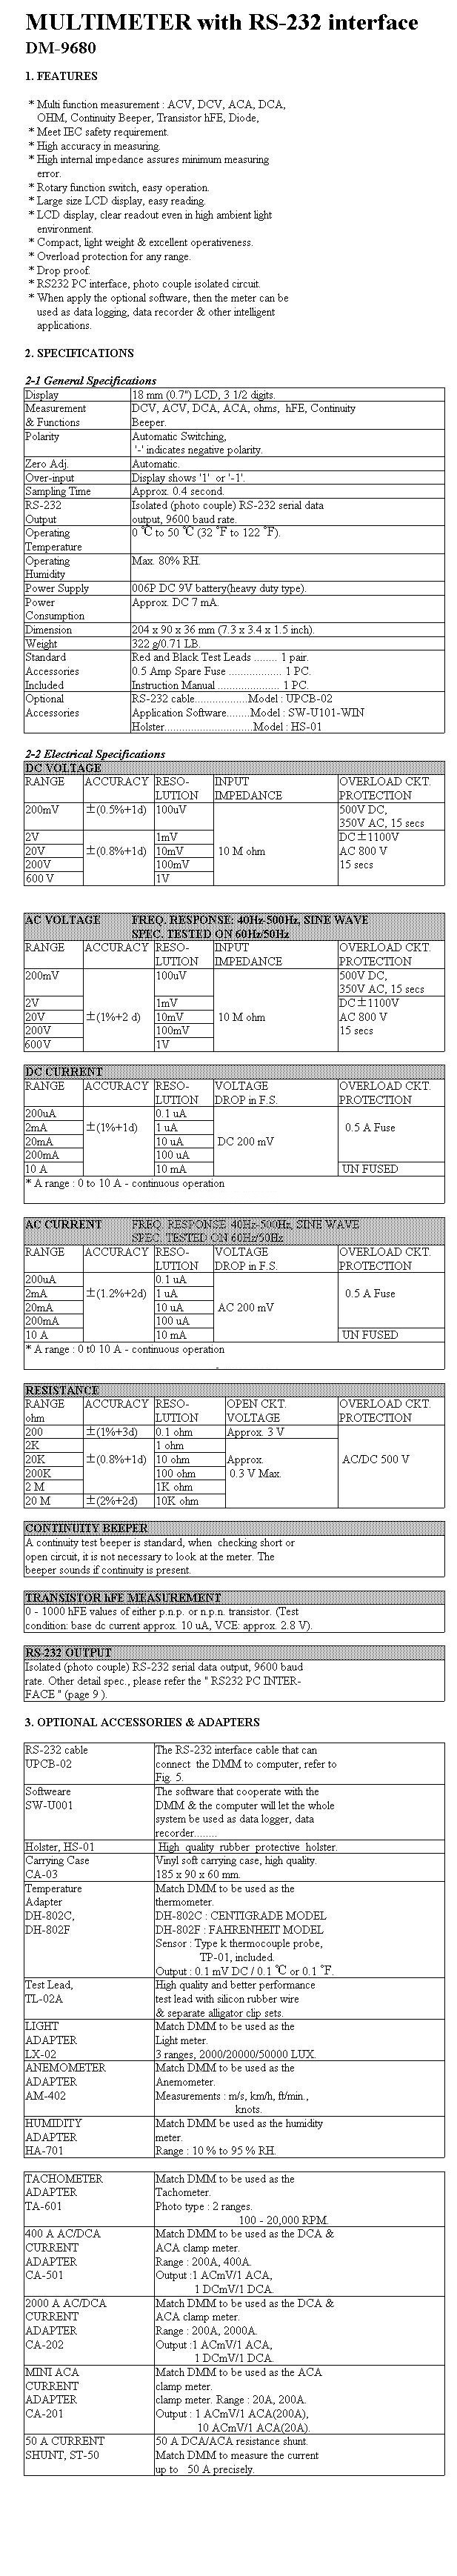 DM9680 kit form